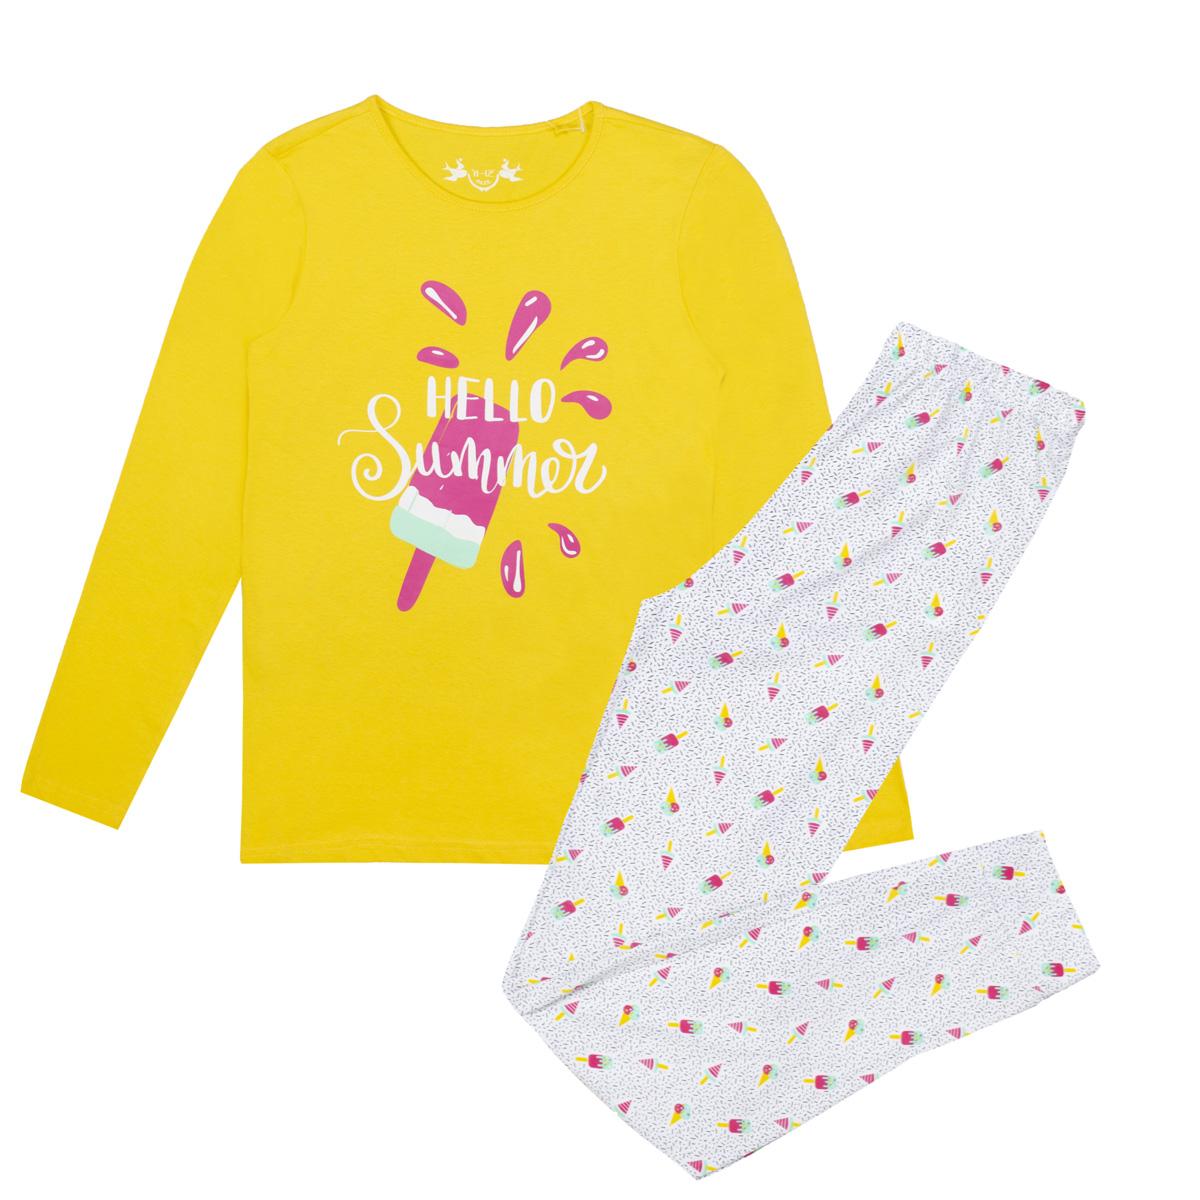 Dekliška pižama, rumena